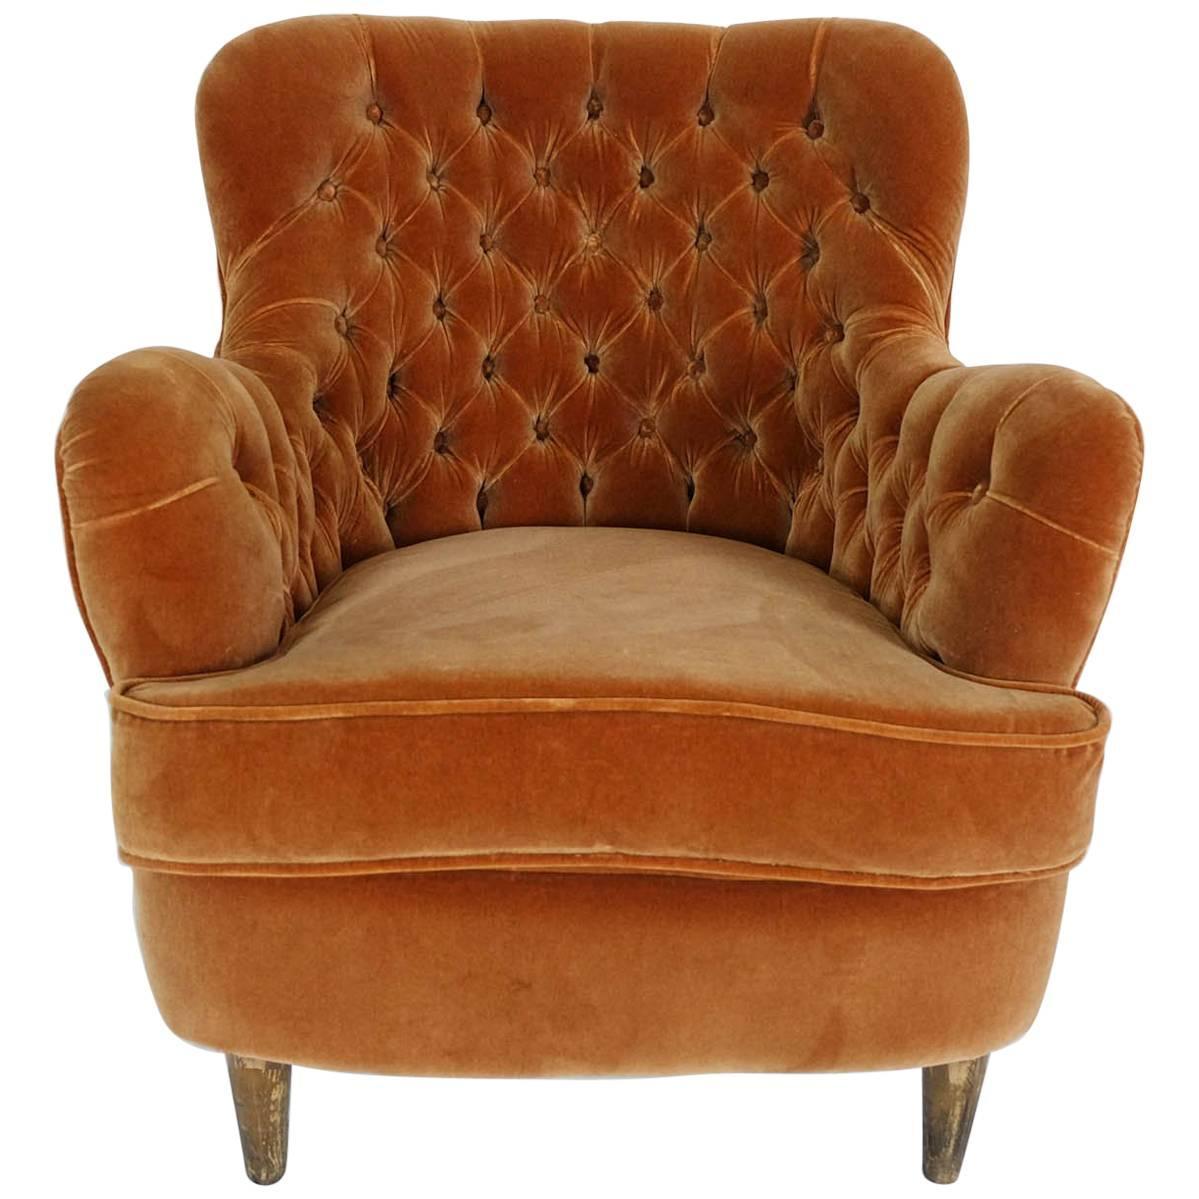 Cozy Elegant Lobby Lounge Chair Elias Svedberg, DK, Sweden 1940